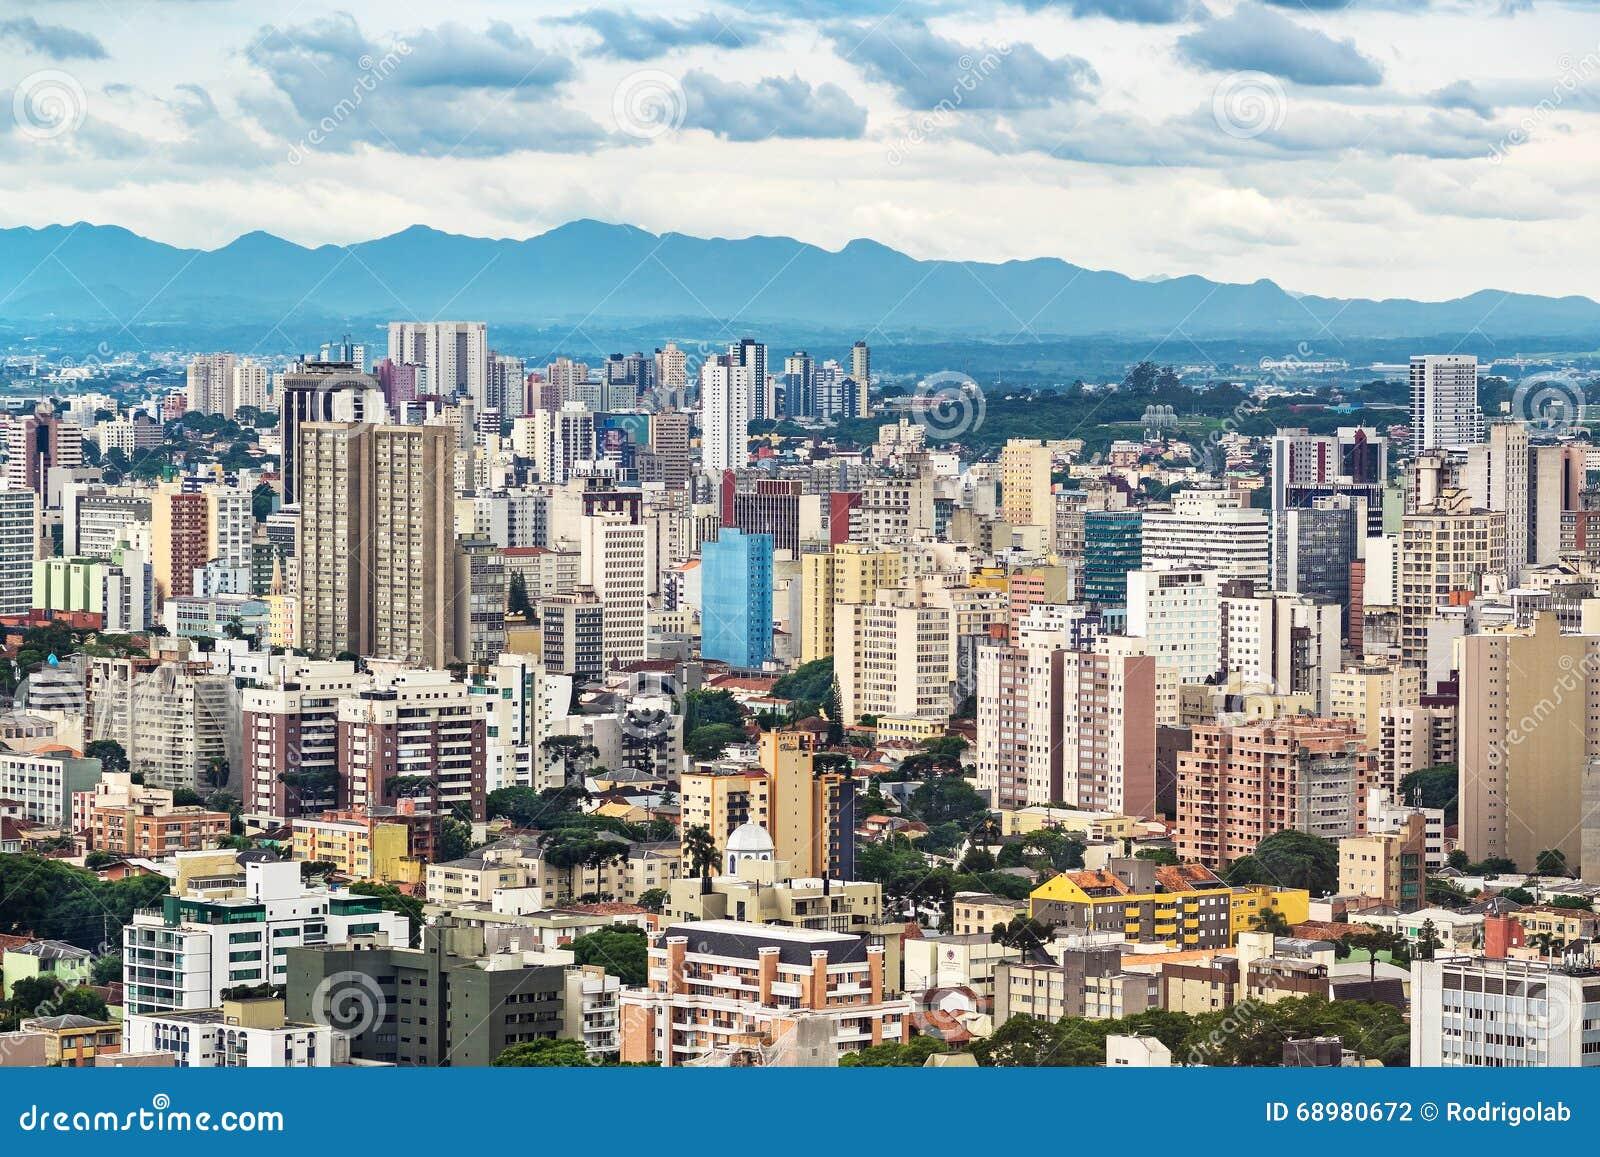 Paisaje urbano de Curitiba, Paraná, el Brasil